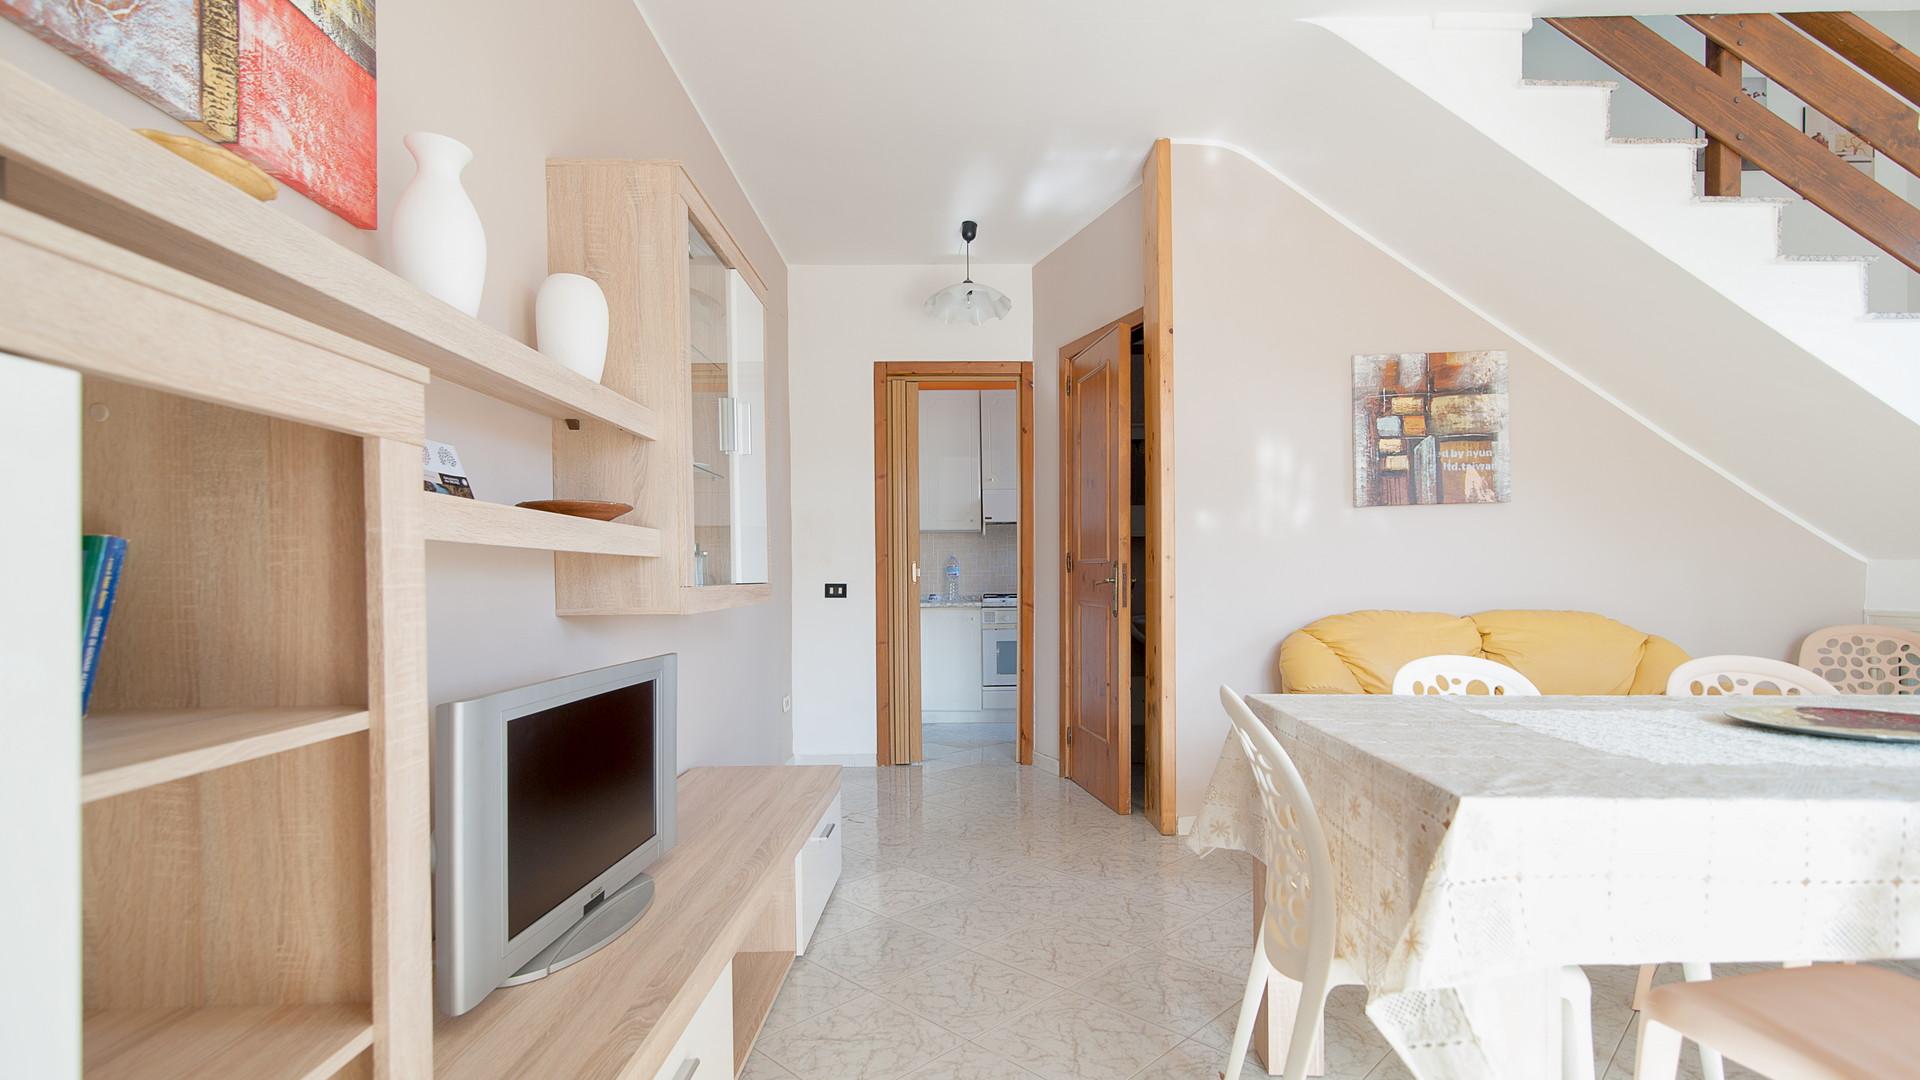 Ferienhaus Villa Due Mari-20 meters from the beach (2354062), Porto Cesareo, Lecce, Apulien, Italien, Bild 2